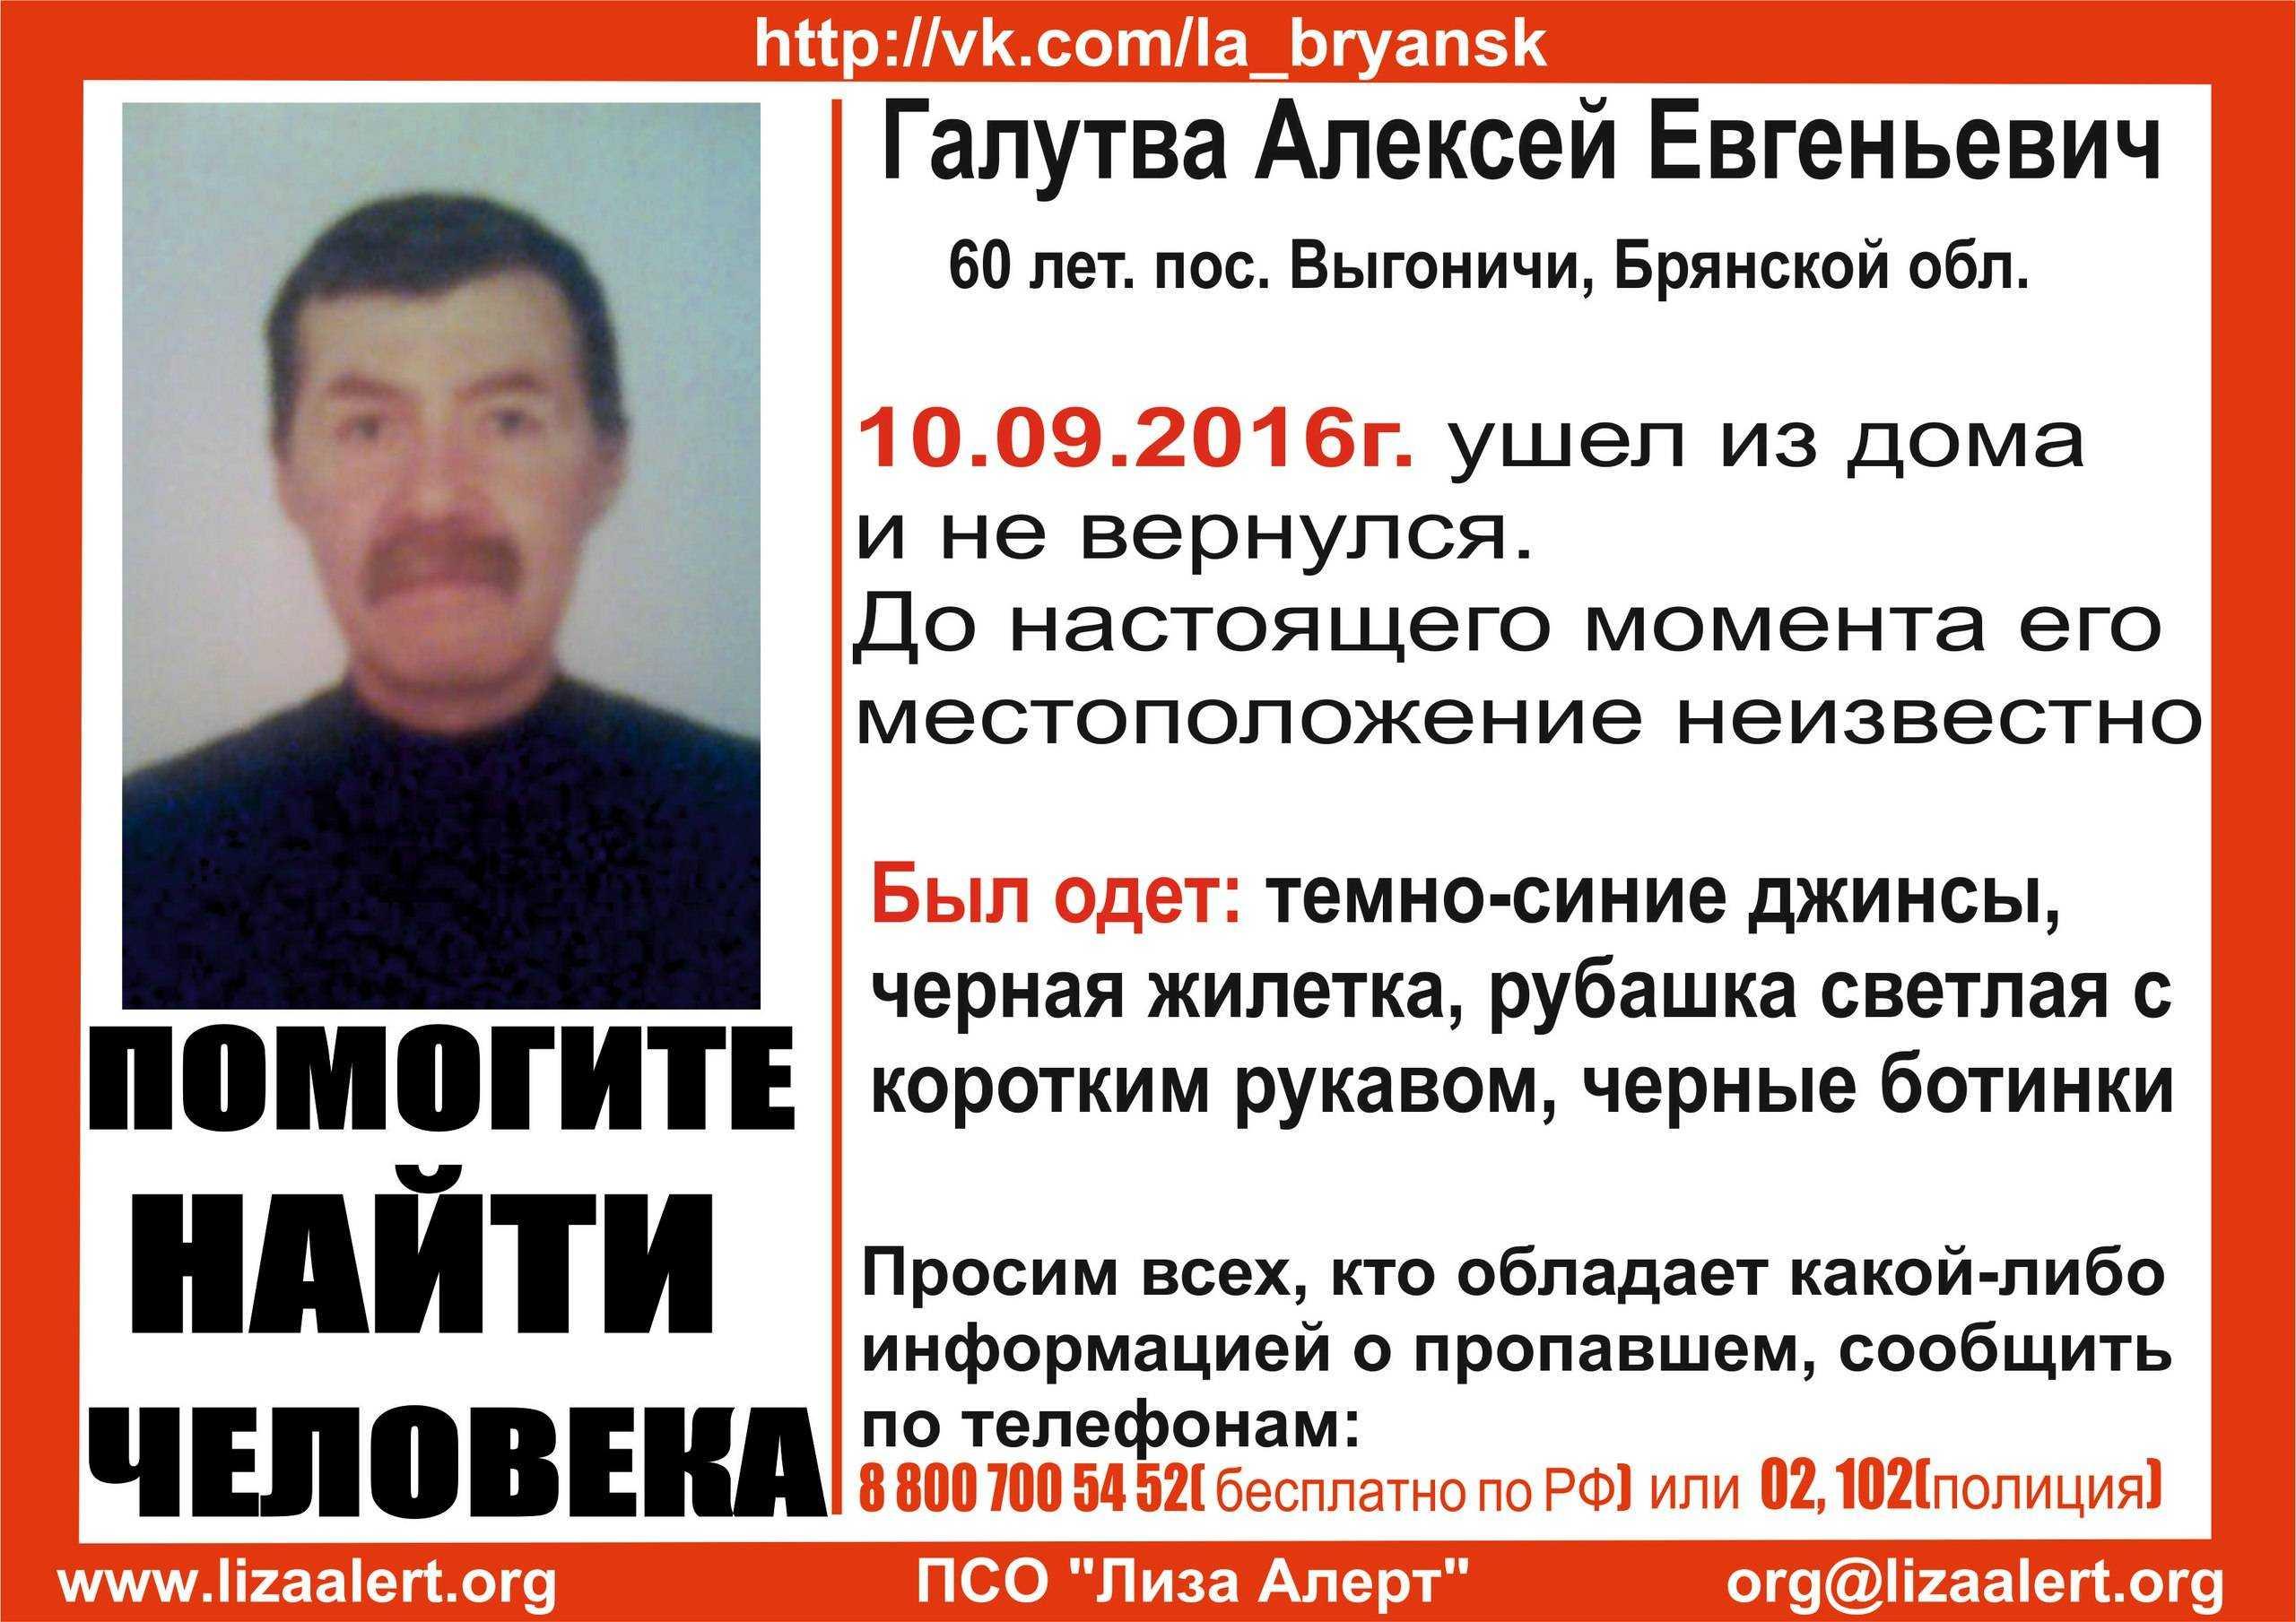 ВБрянске пропала 19-летняя студентка техникума индустрии сервиса